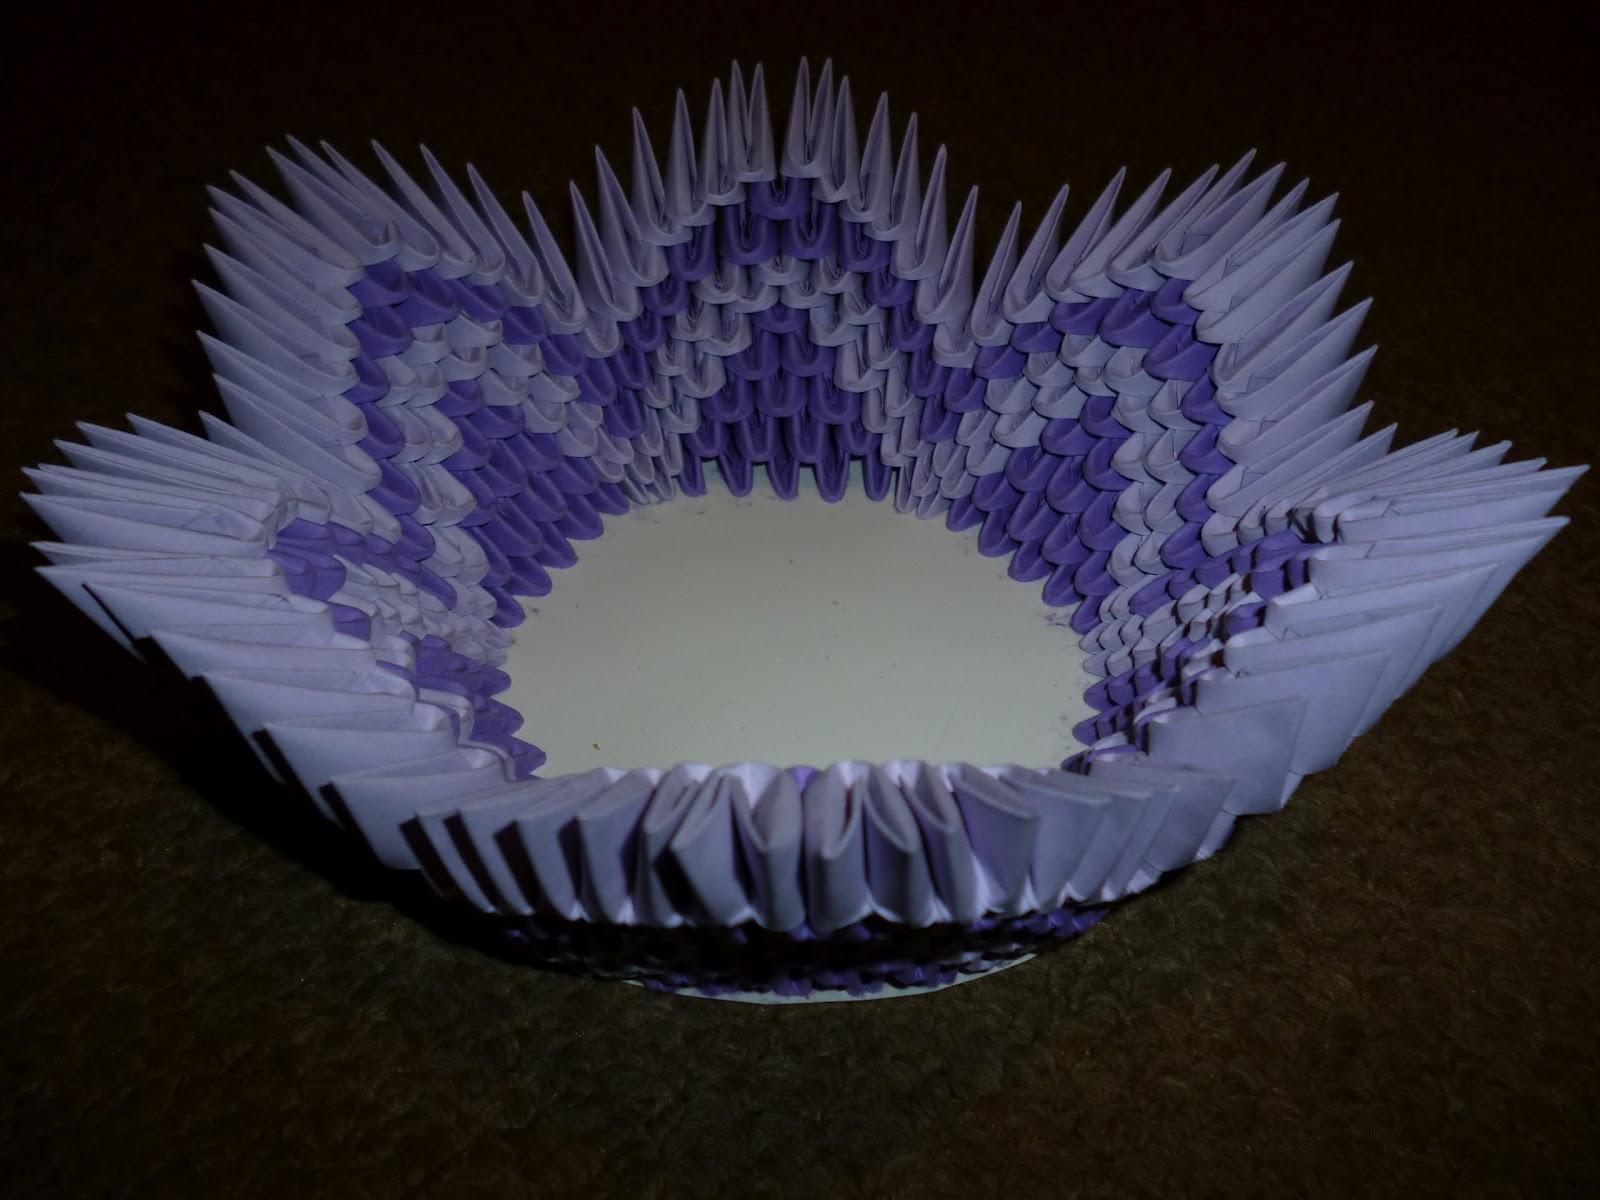 Papírvilág: 3d origami kosár / 3d origami basket - photo#17